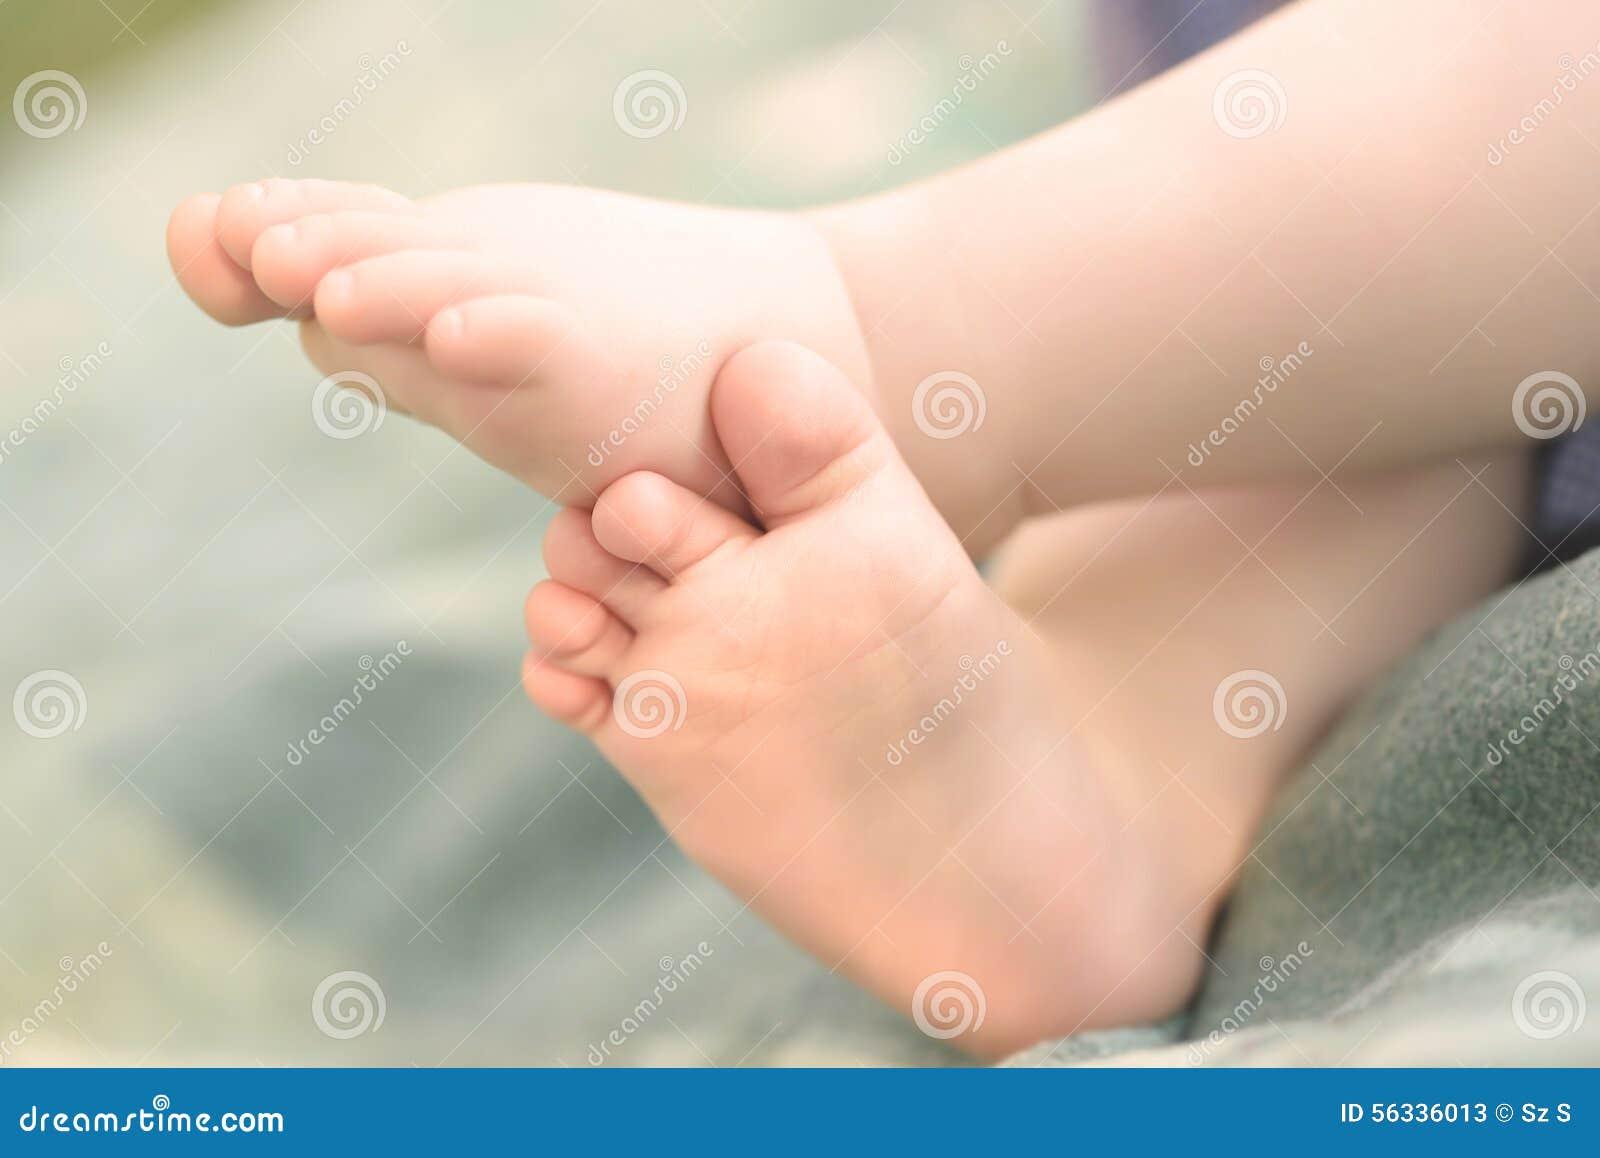 Closeup photo of baby legs Legs